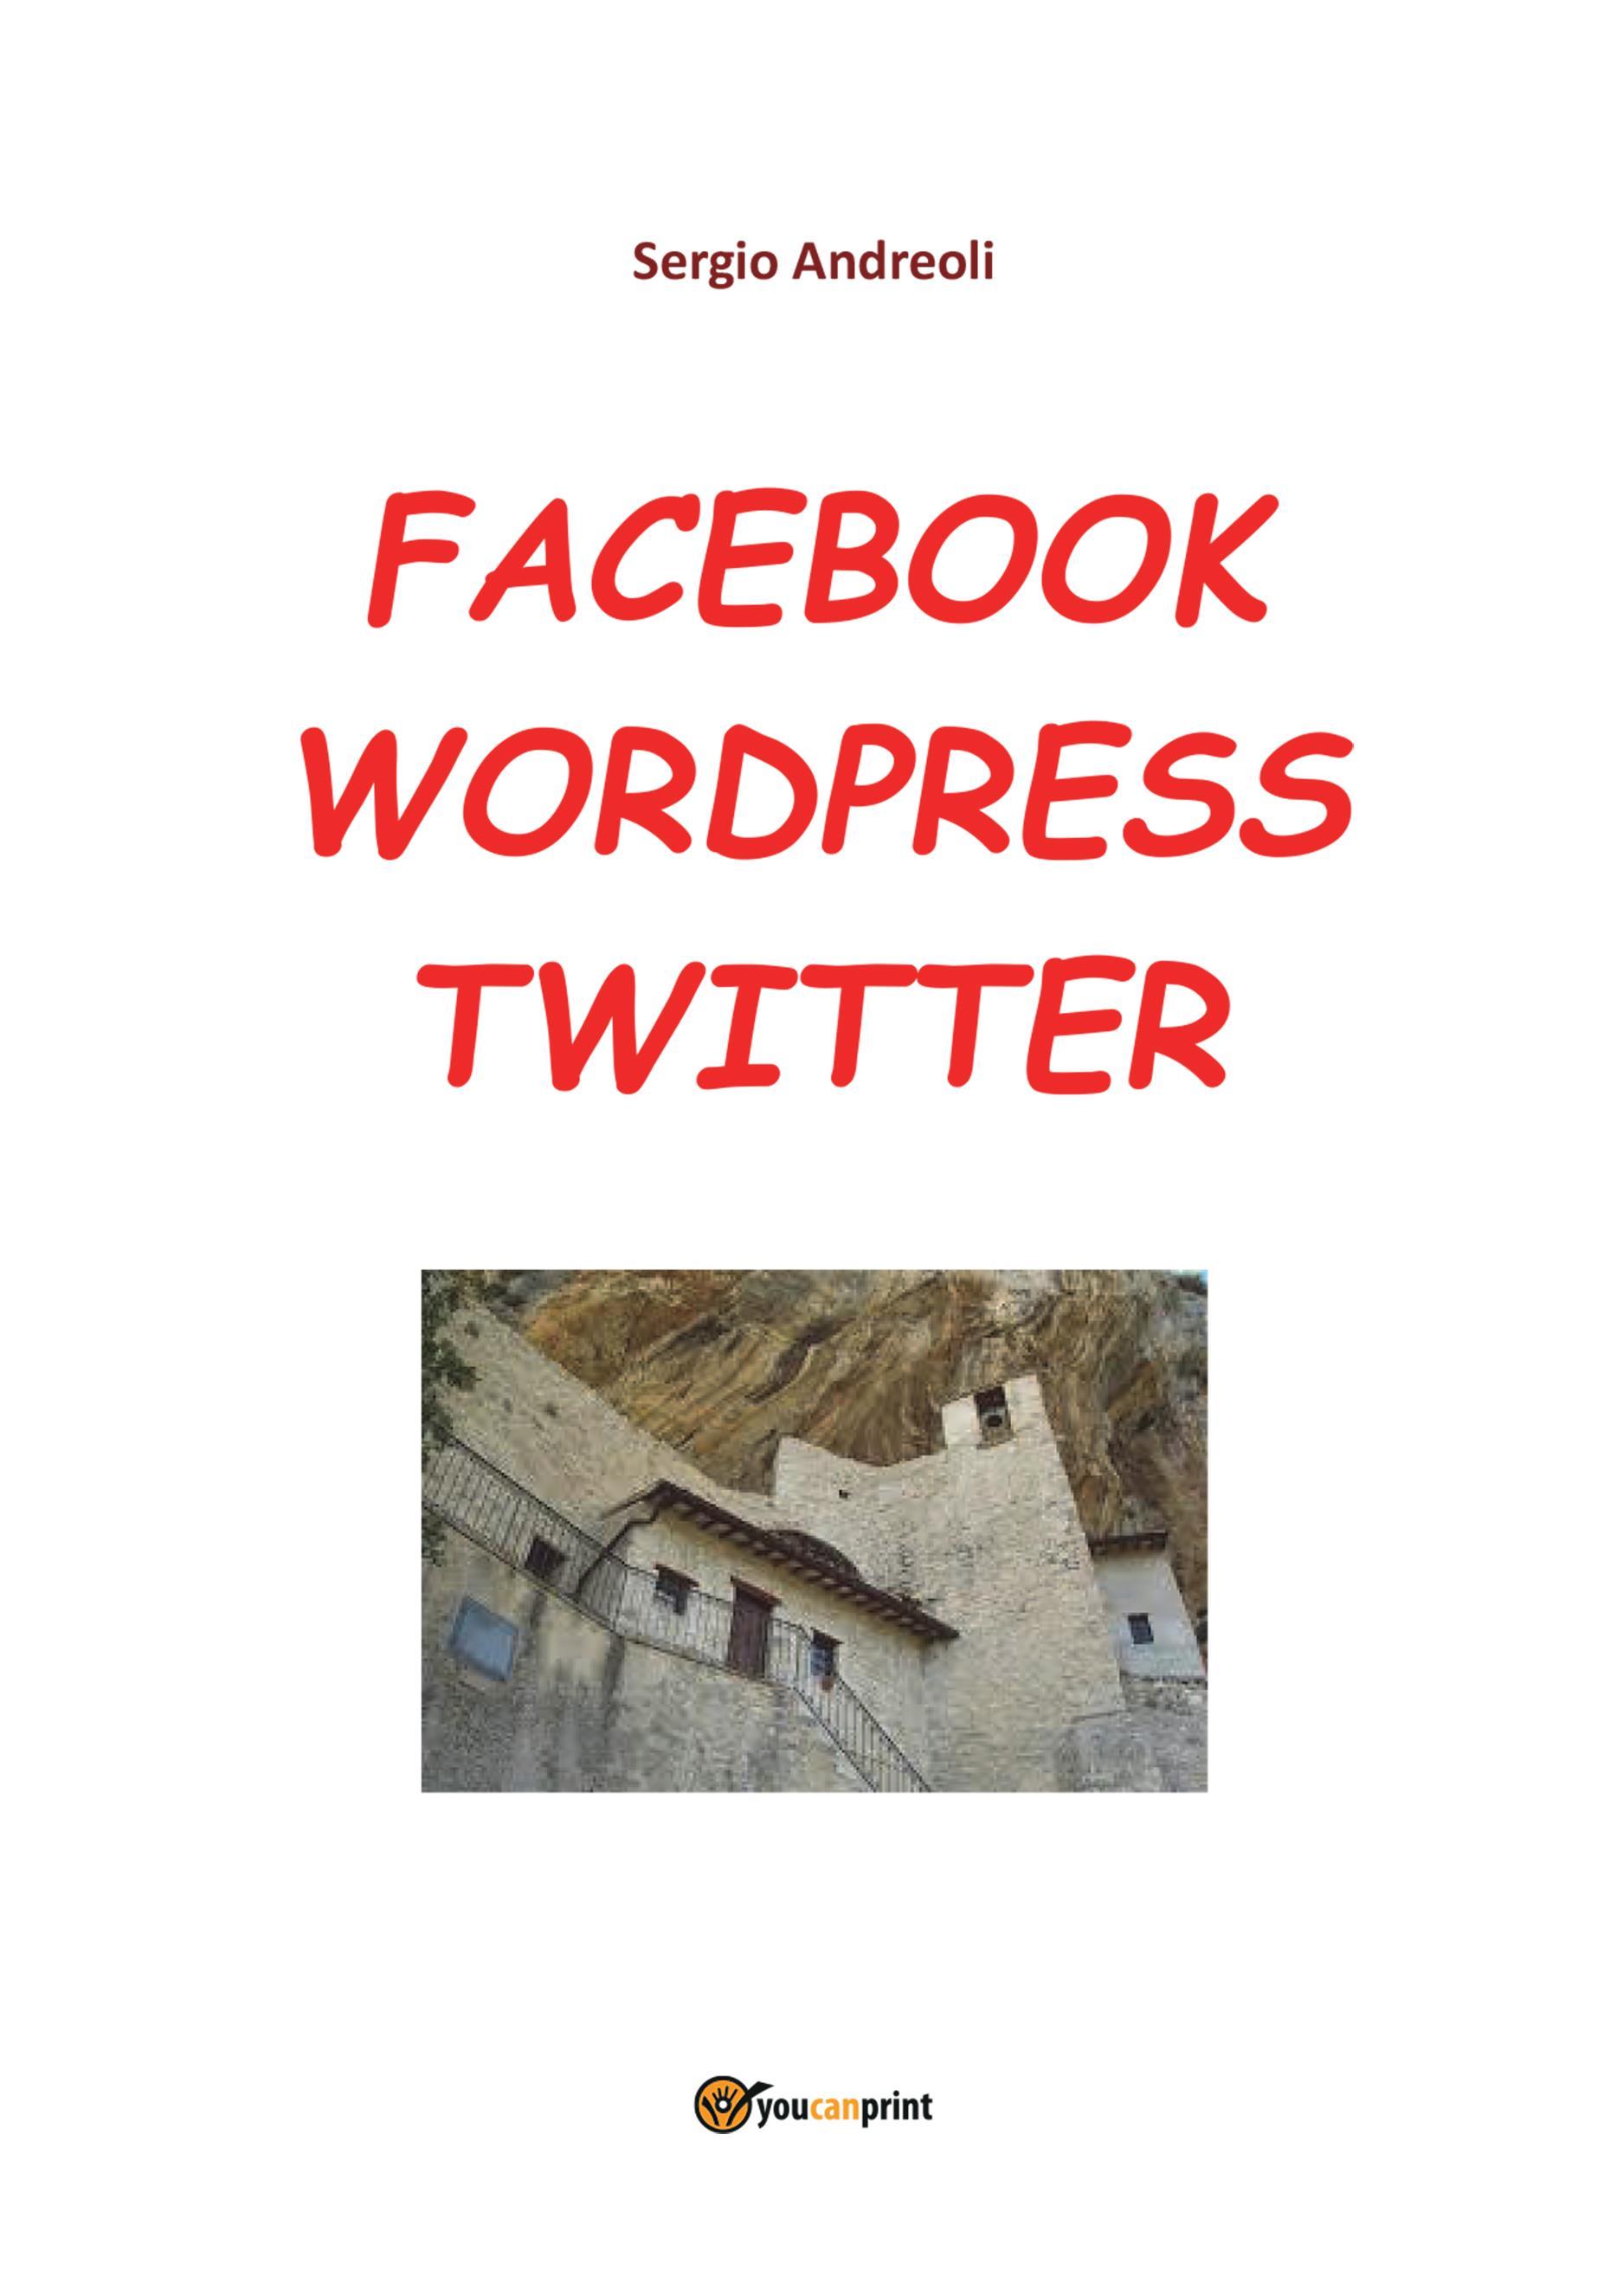 Facebook, Wordpress, Twitter per comunicare